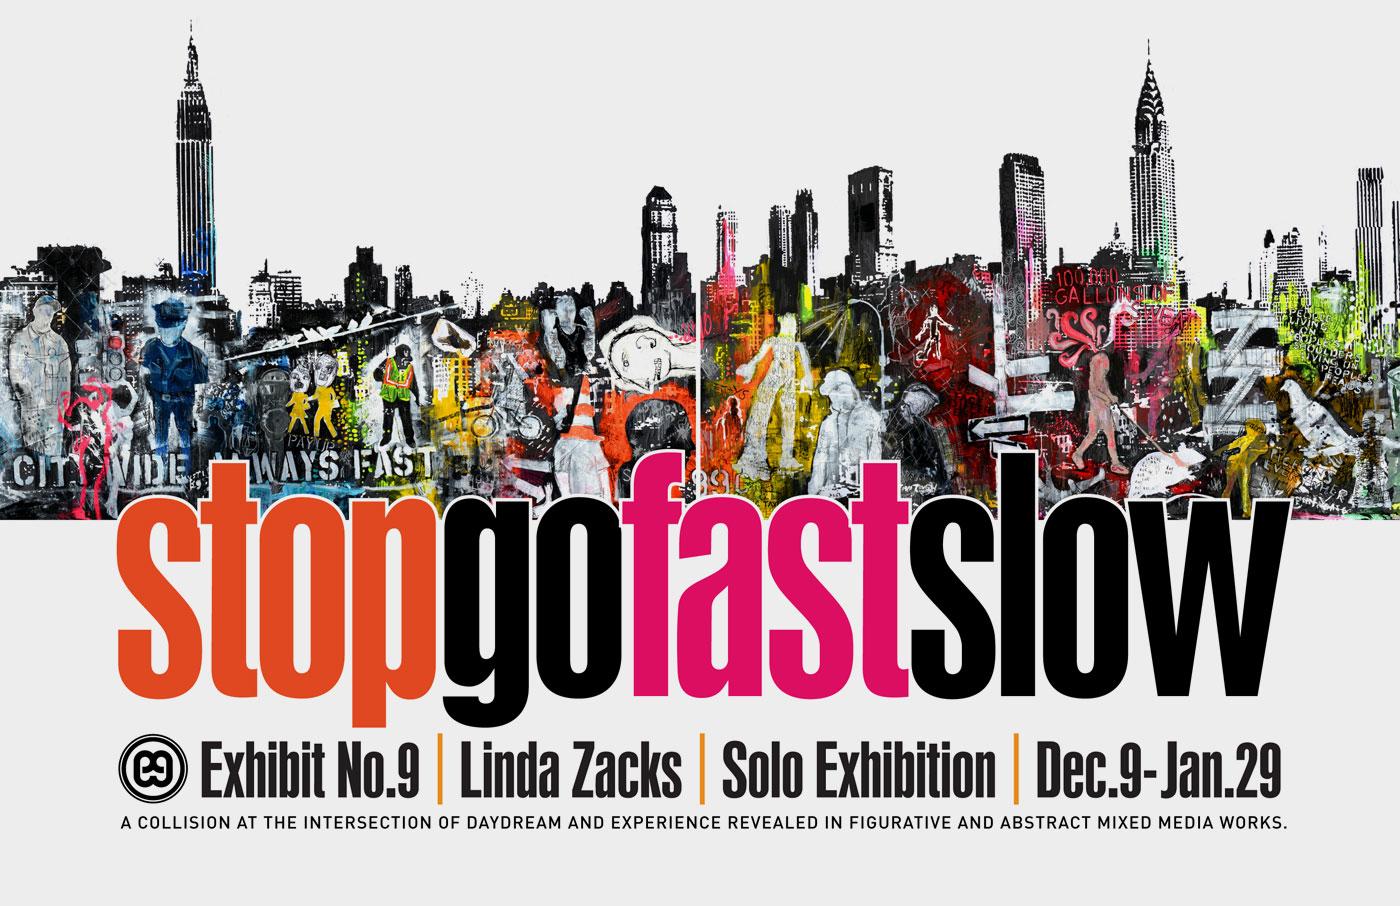 stopgofastslow-card-front.jpg